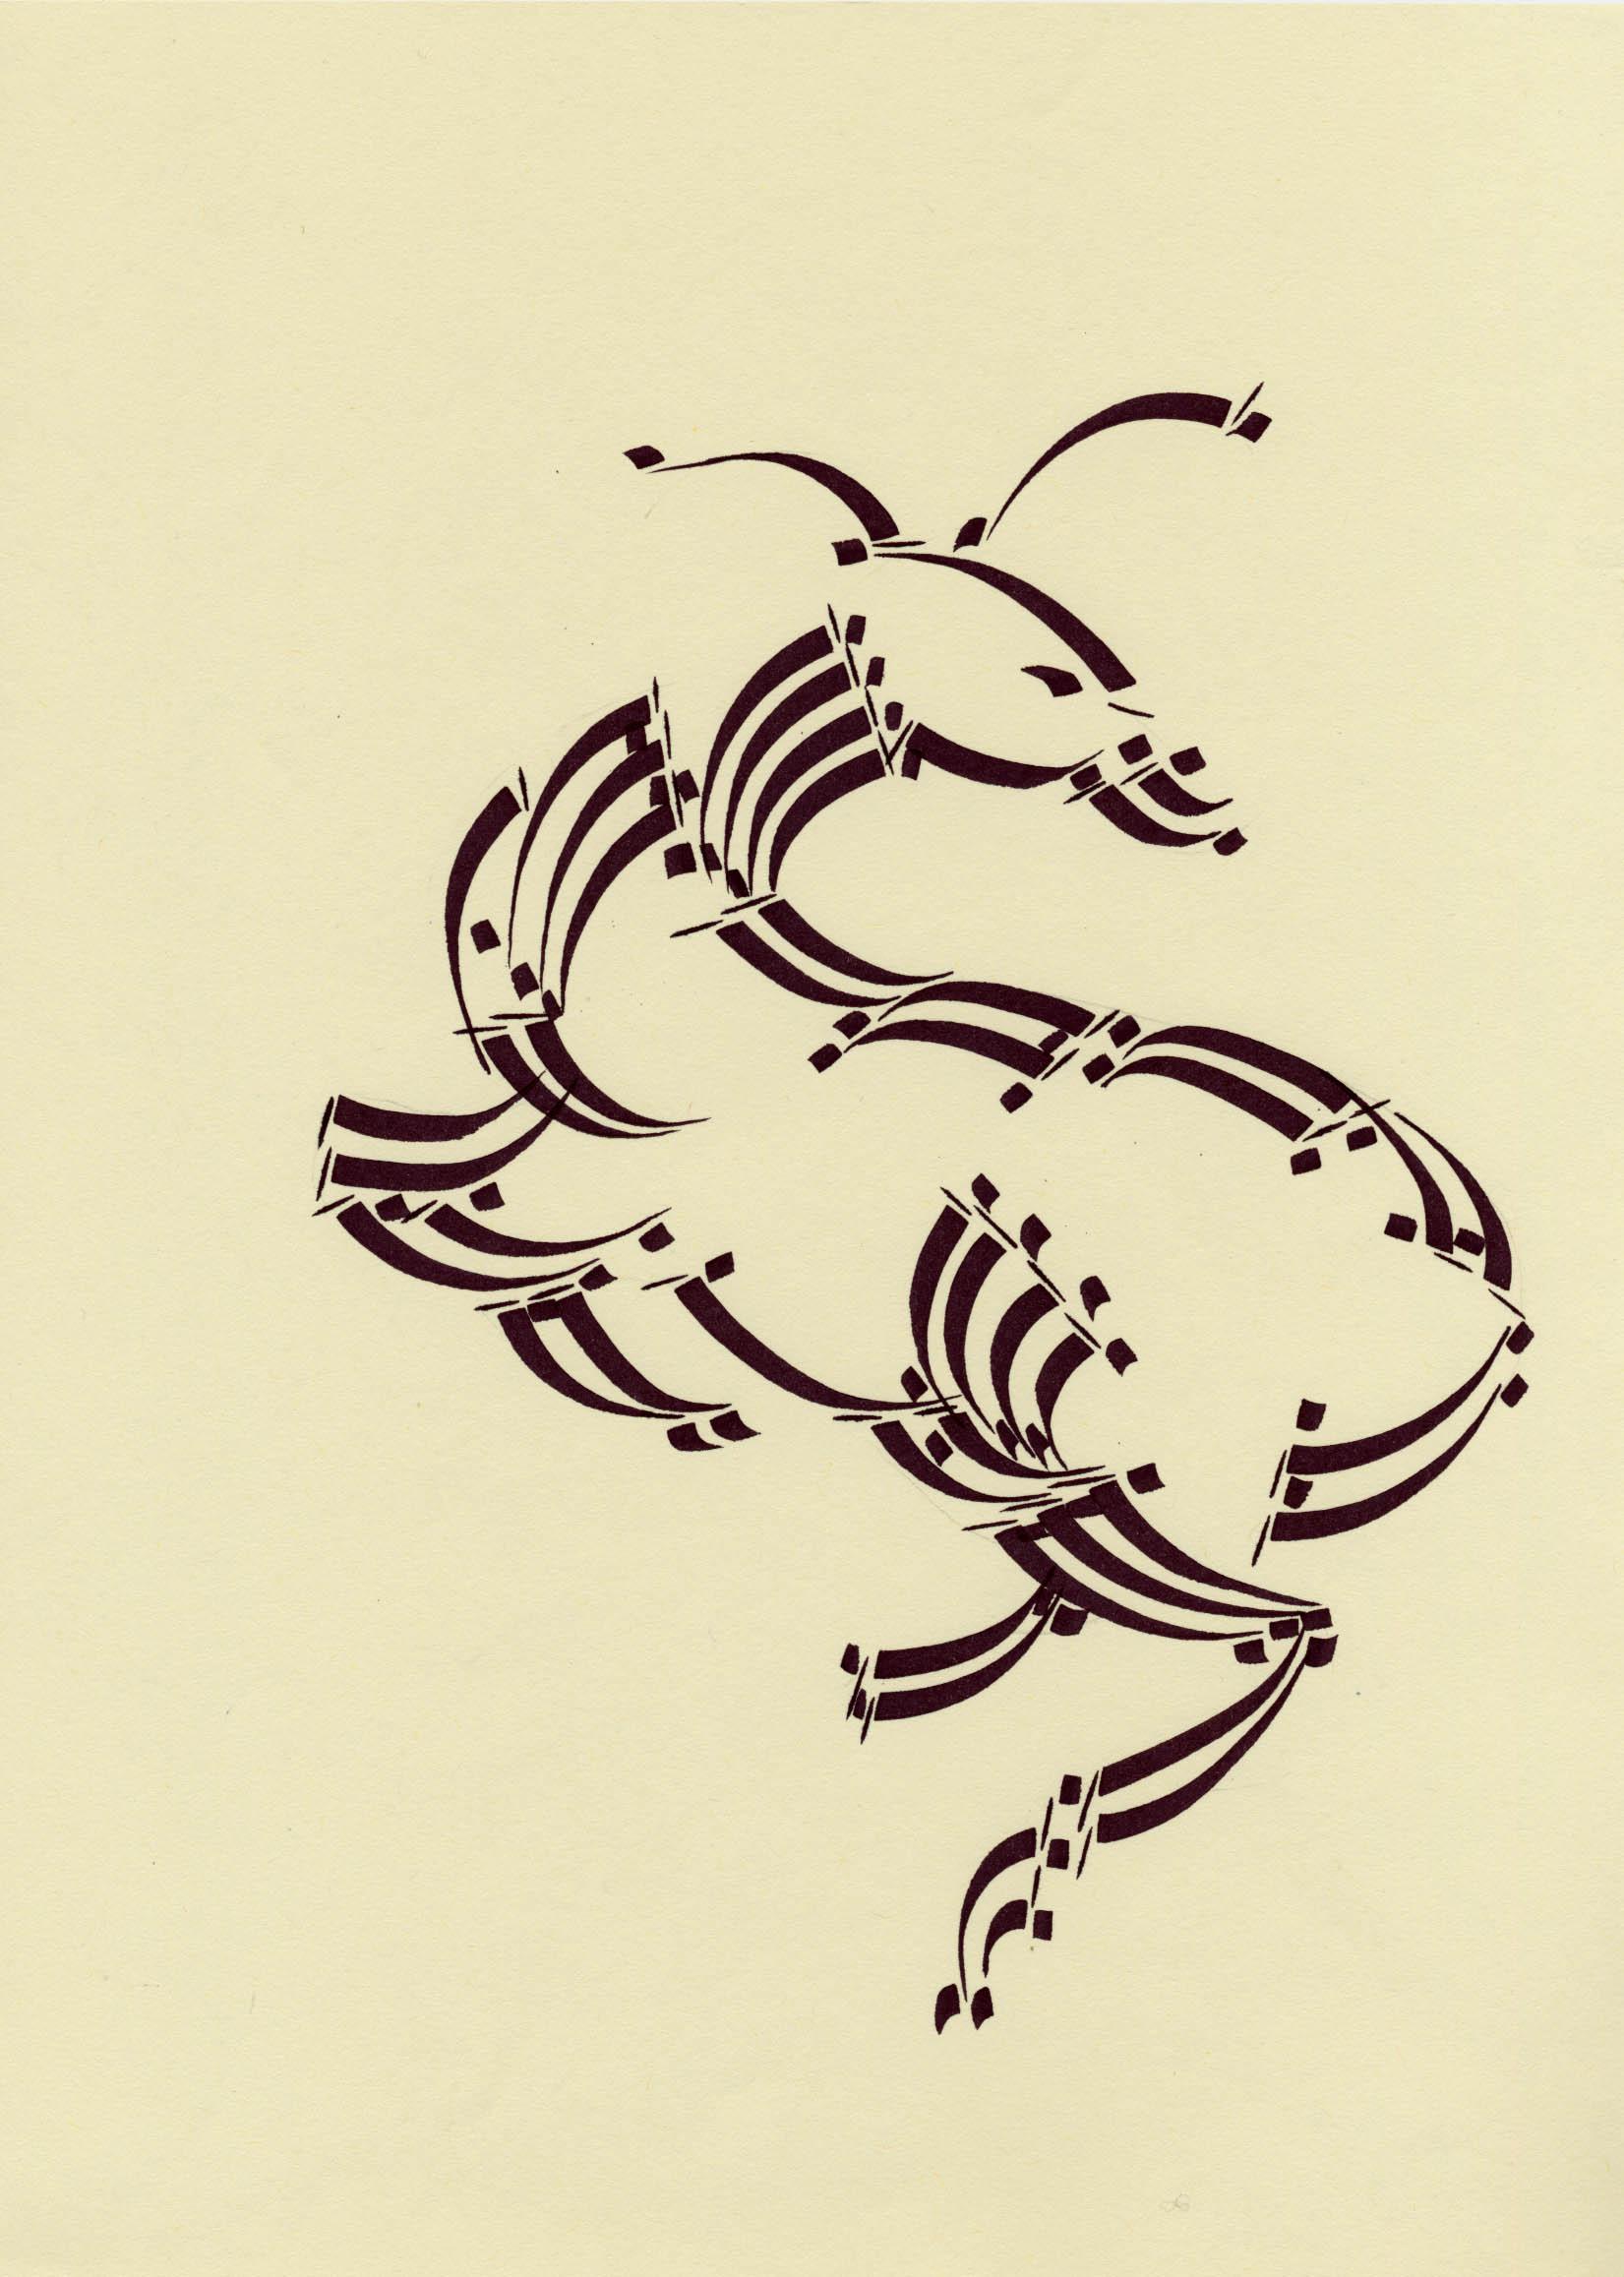 Parastou Forouhar, Persian For Beginners, 1997-2012